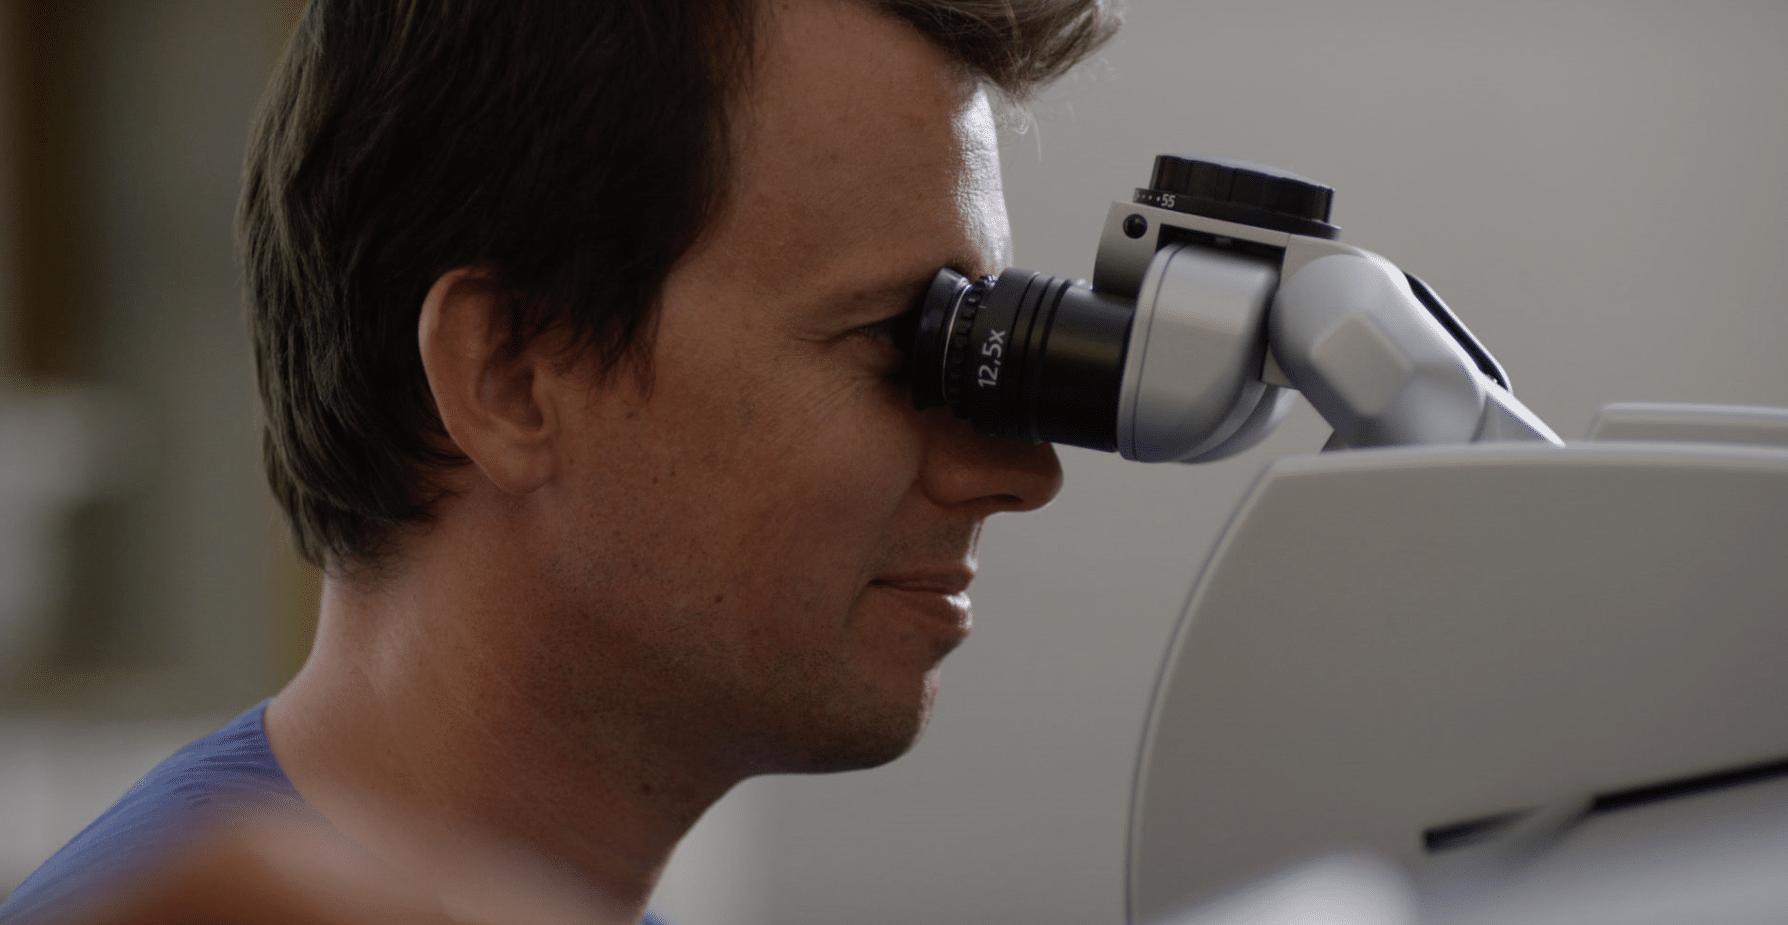 SLT-Therapie wirksam bei Glaukom